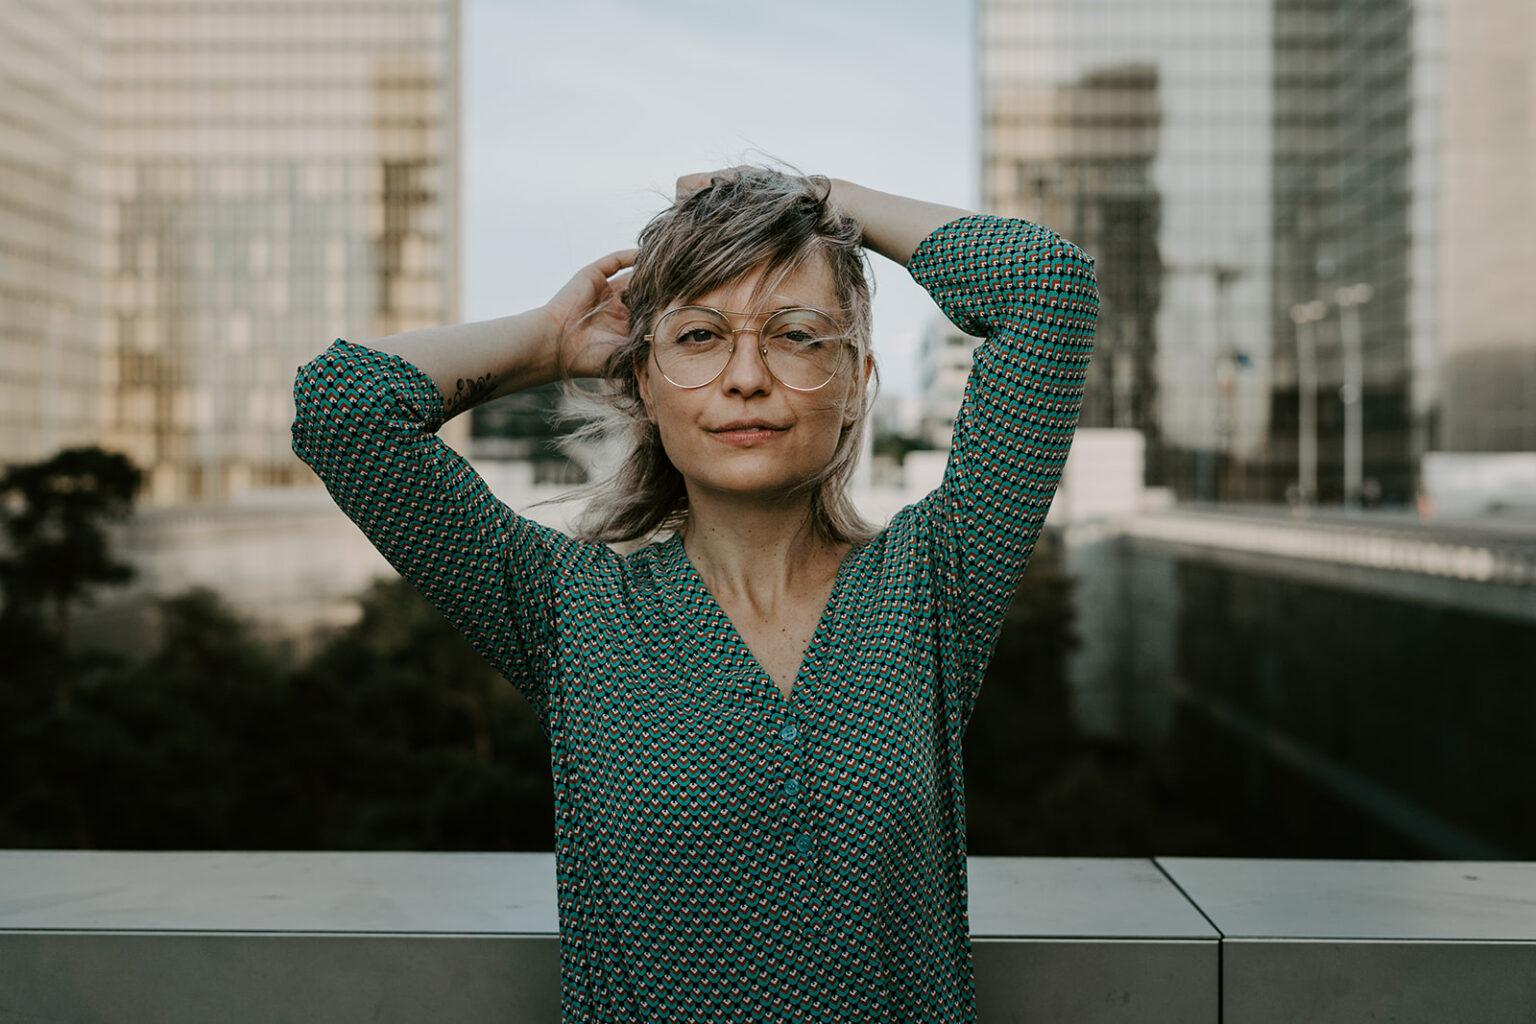 Chiara Gandolfi copywriter di BalenalaB